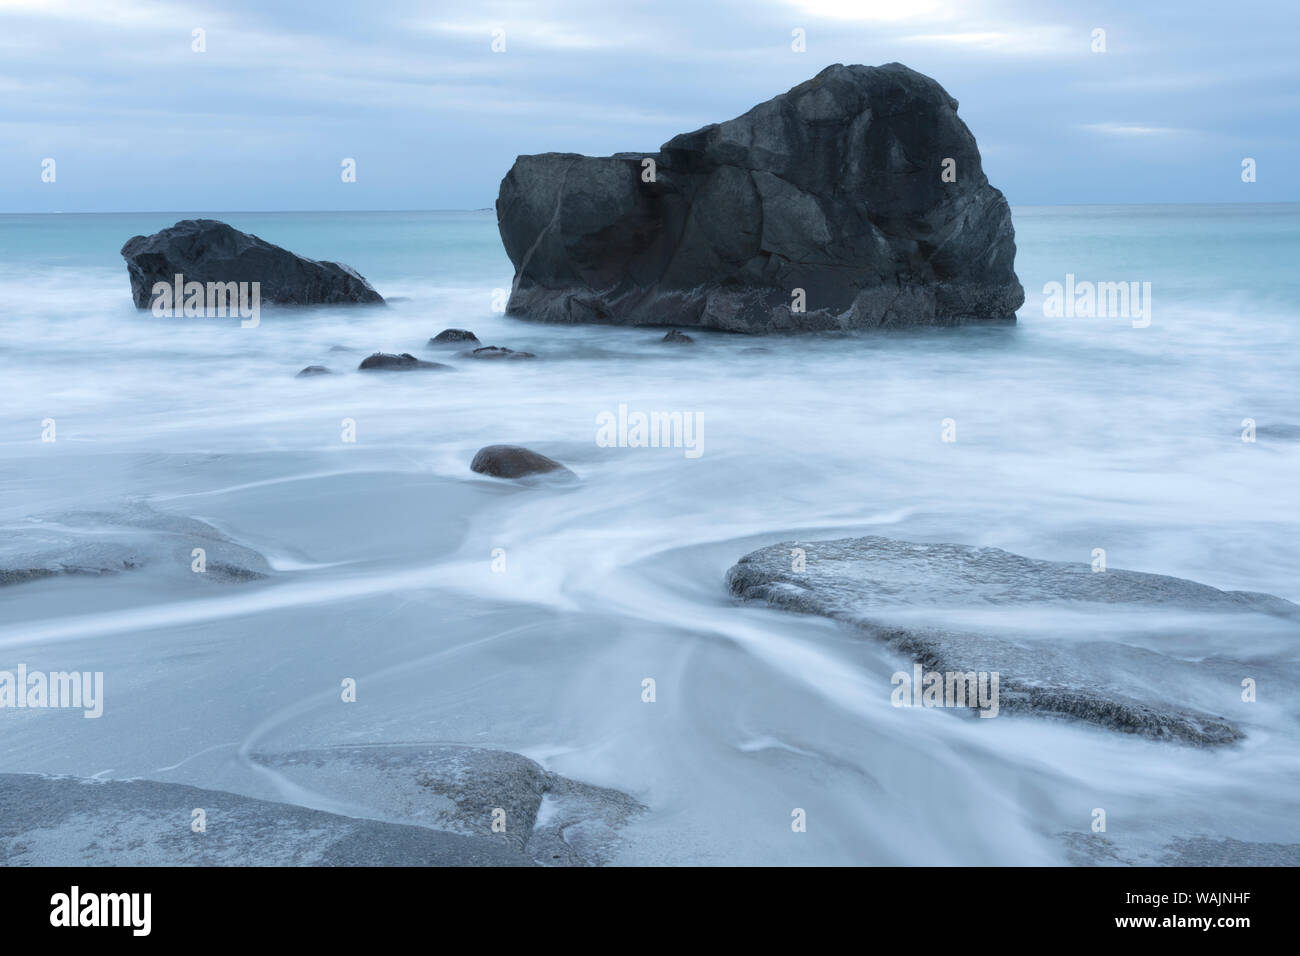 Norway, Lofoten Islands, Vestvag Island, Leknes. Here on the western side of Vestvag Island, the dark rocks contrast with the white water. Stock Photo